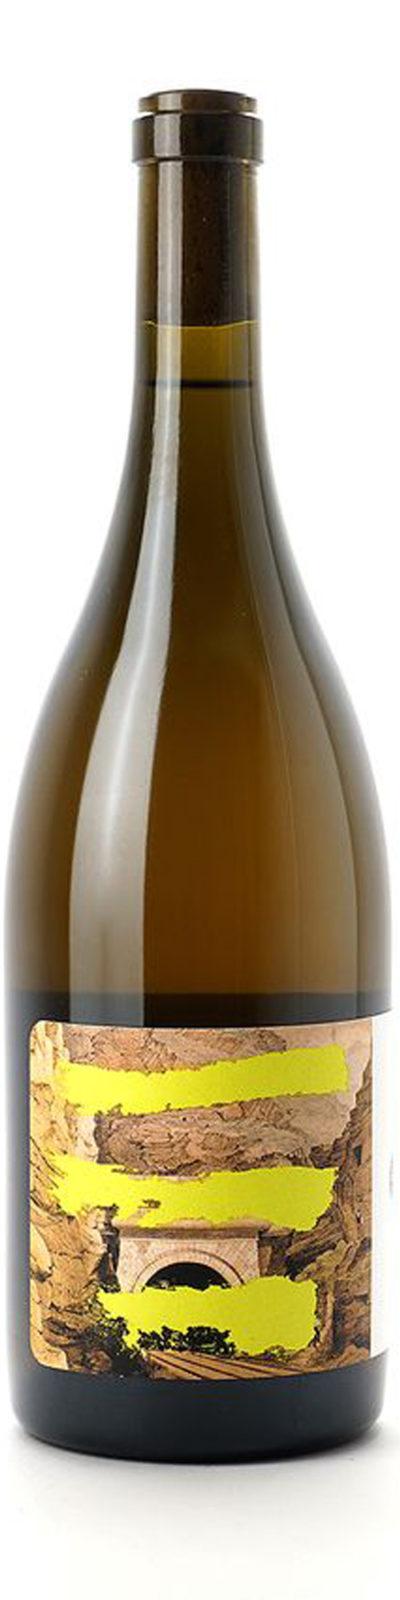 Rorick Vineyard Chardonnay